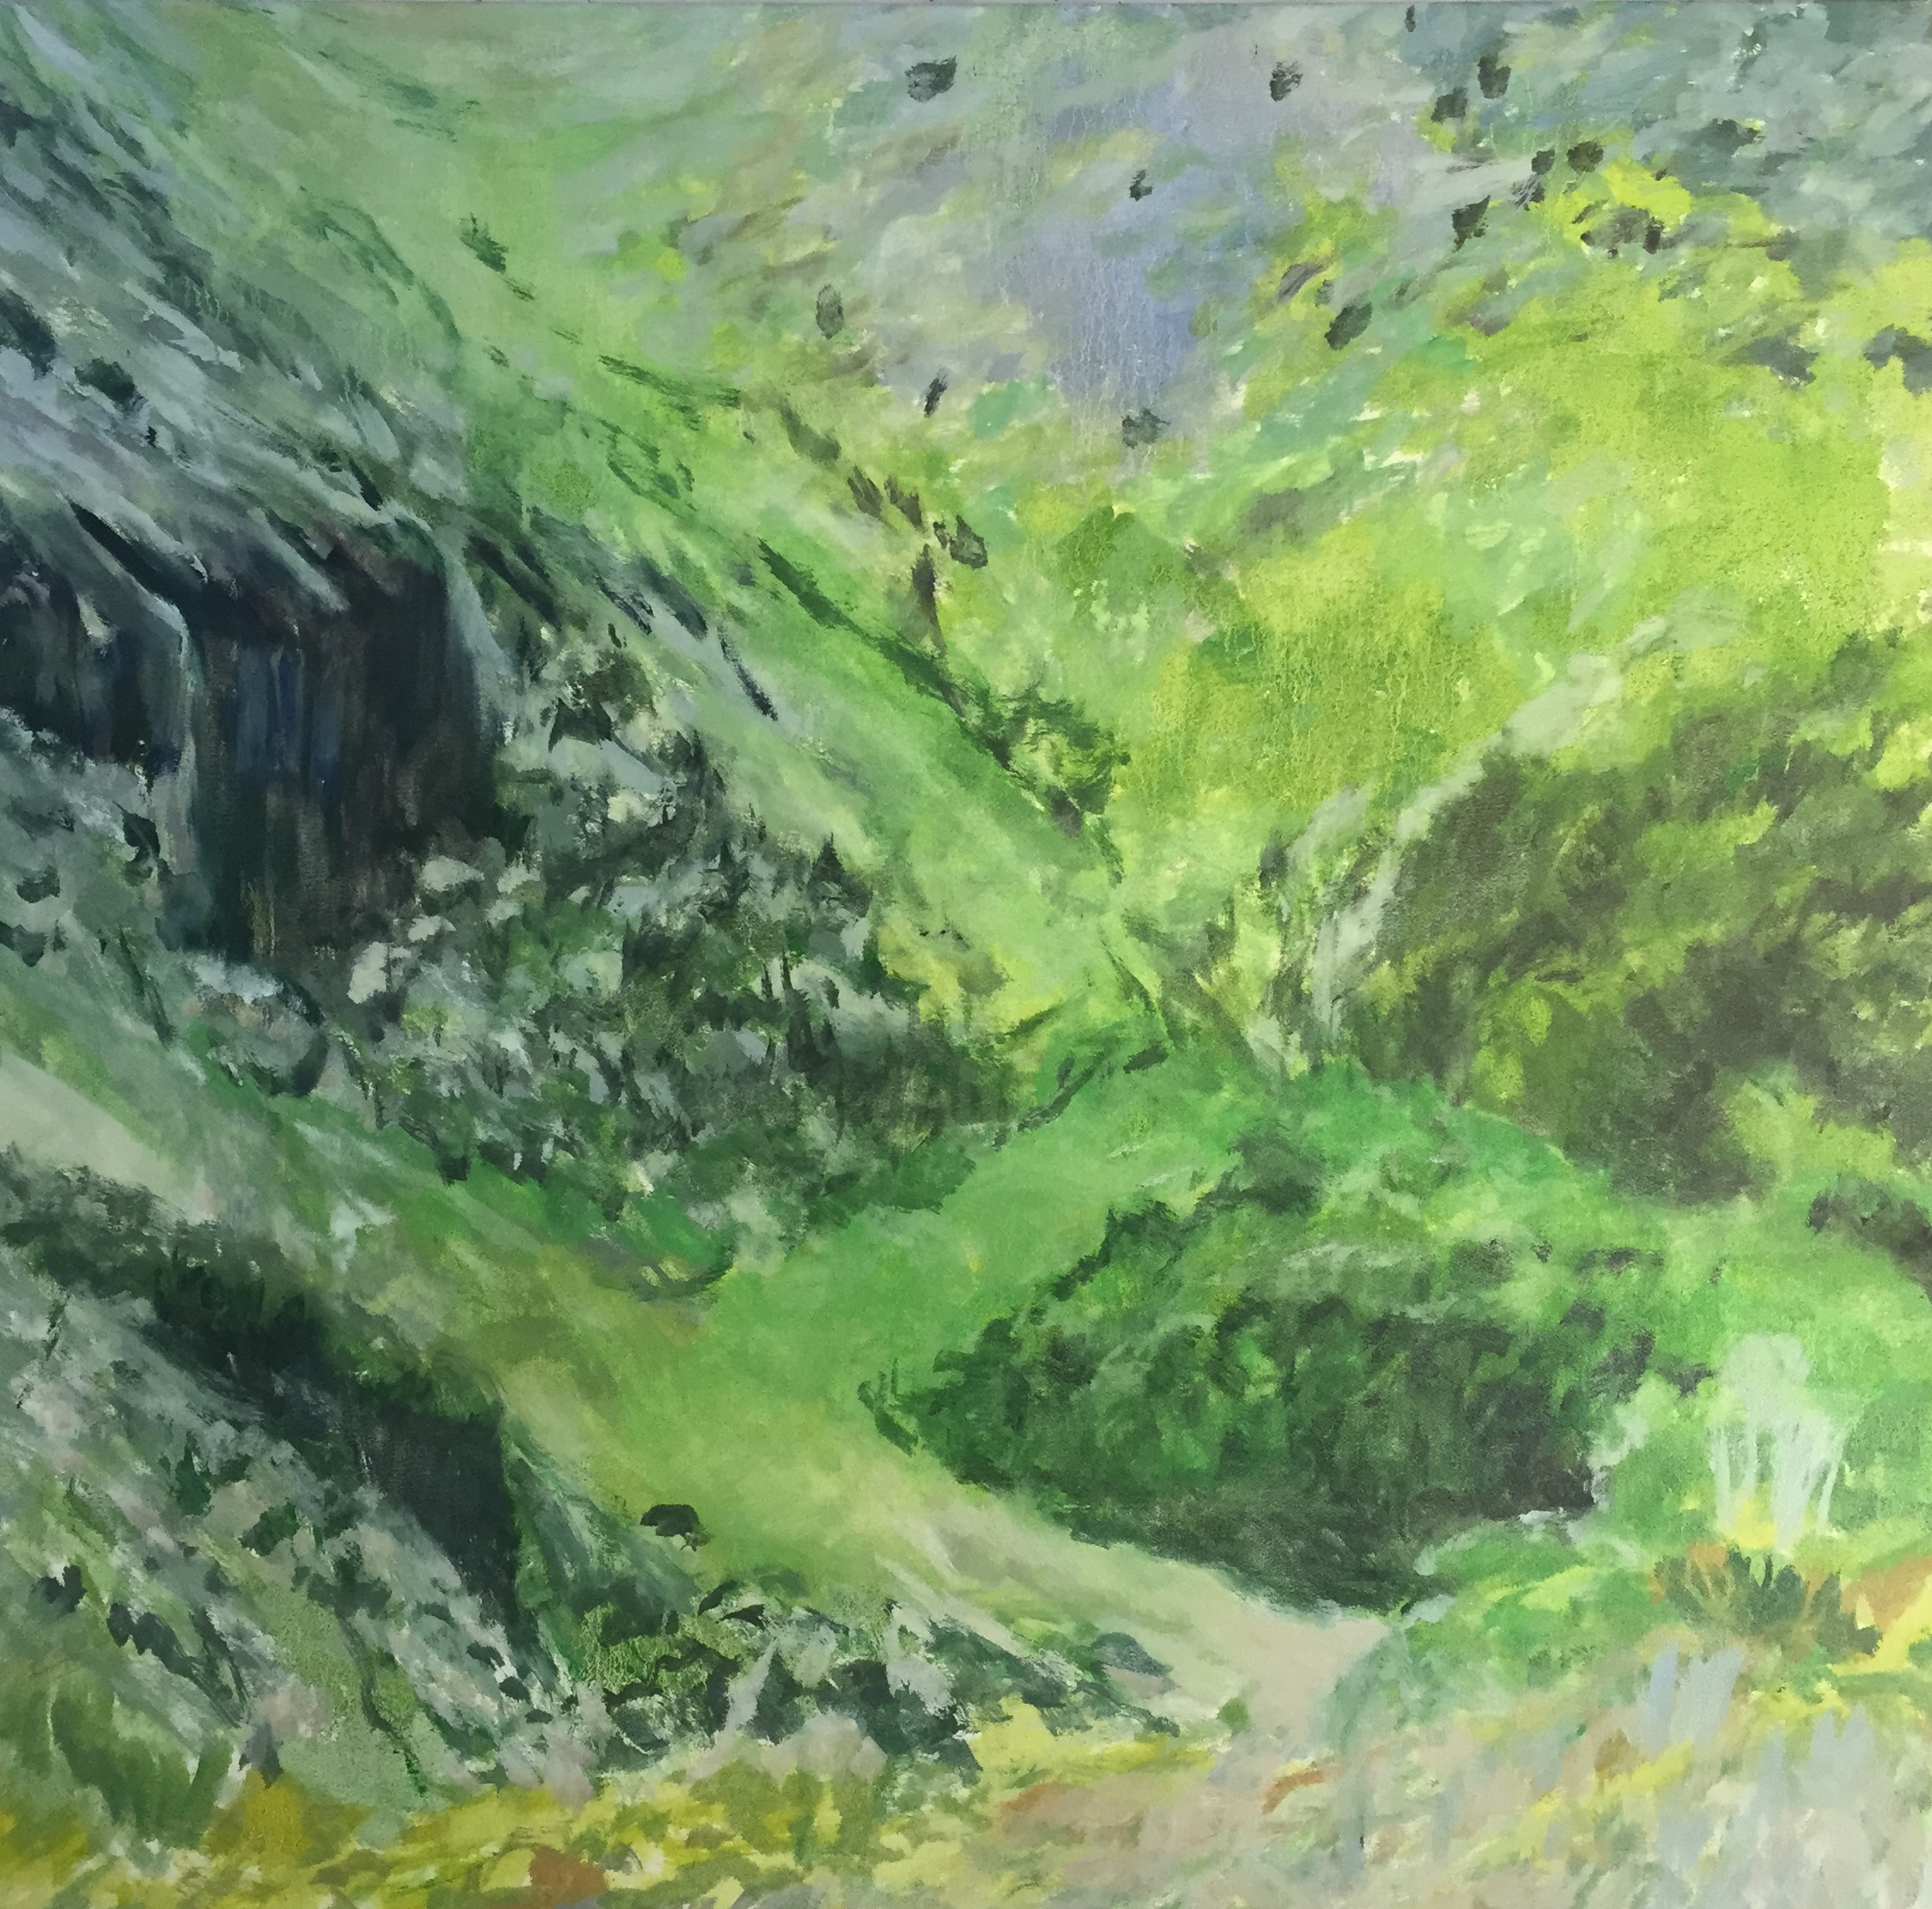 Abstract Ravine, 2013